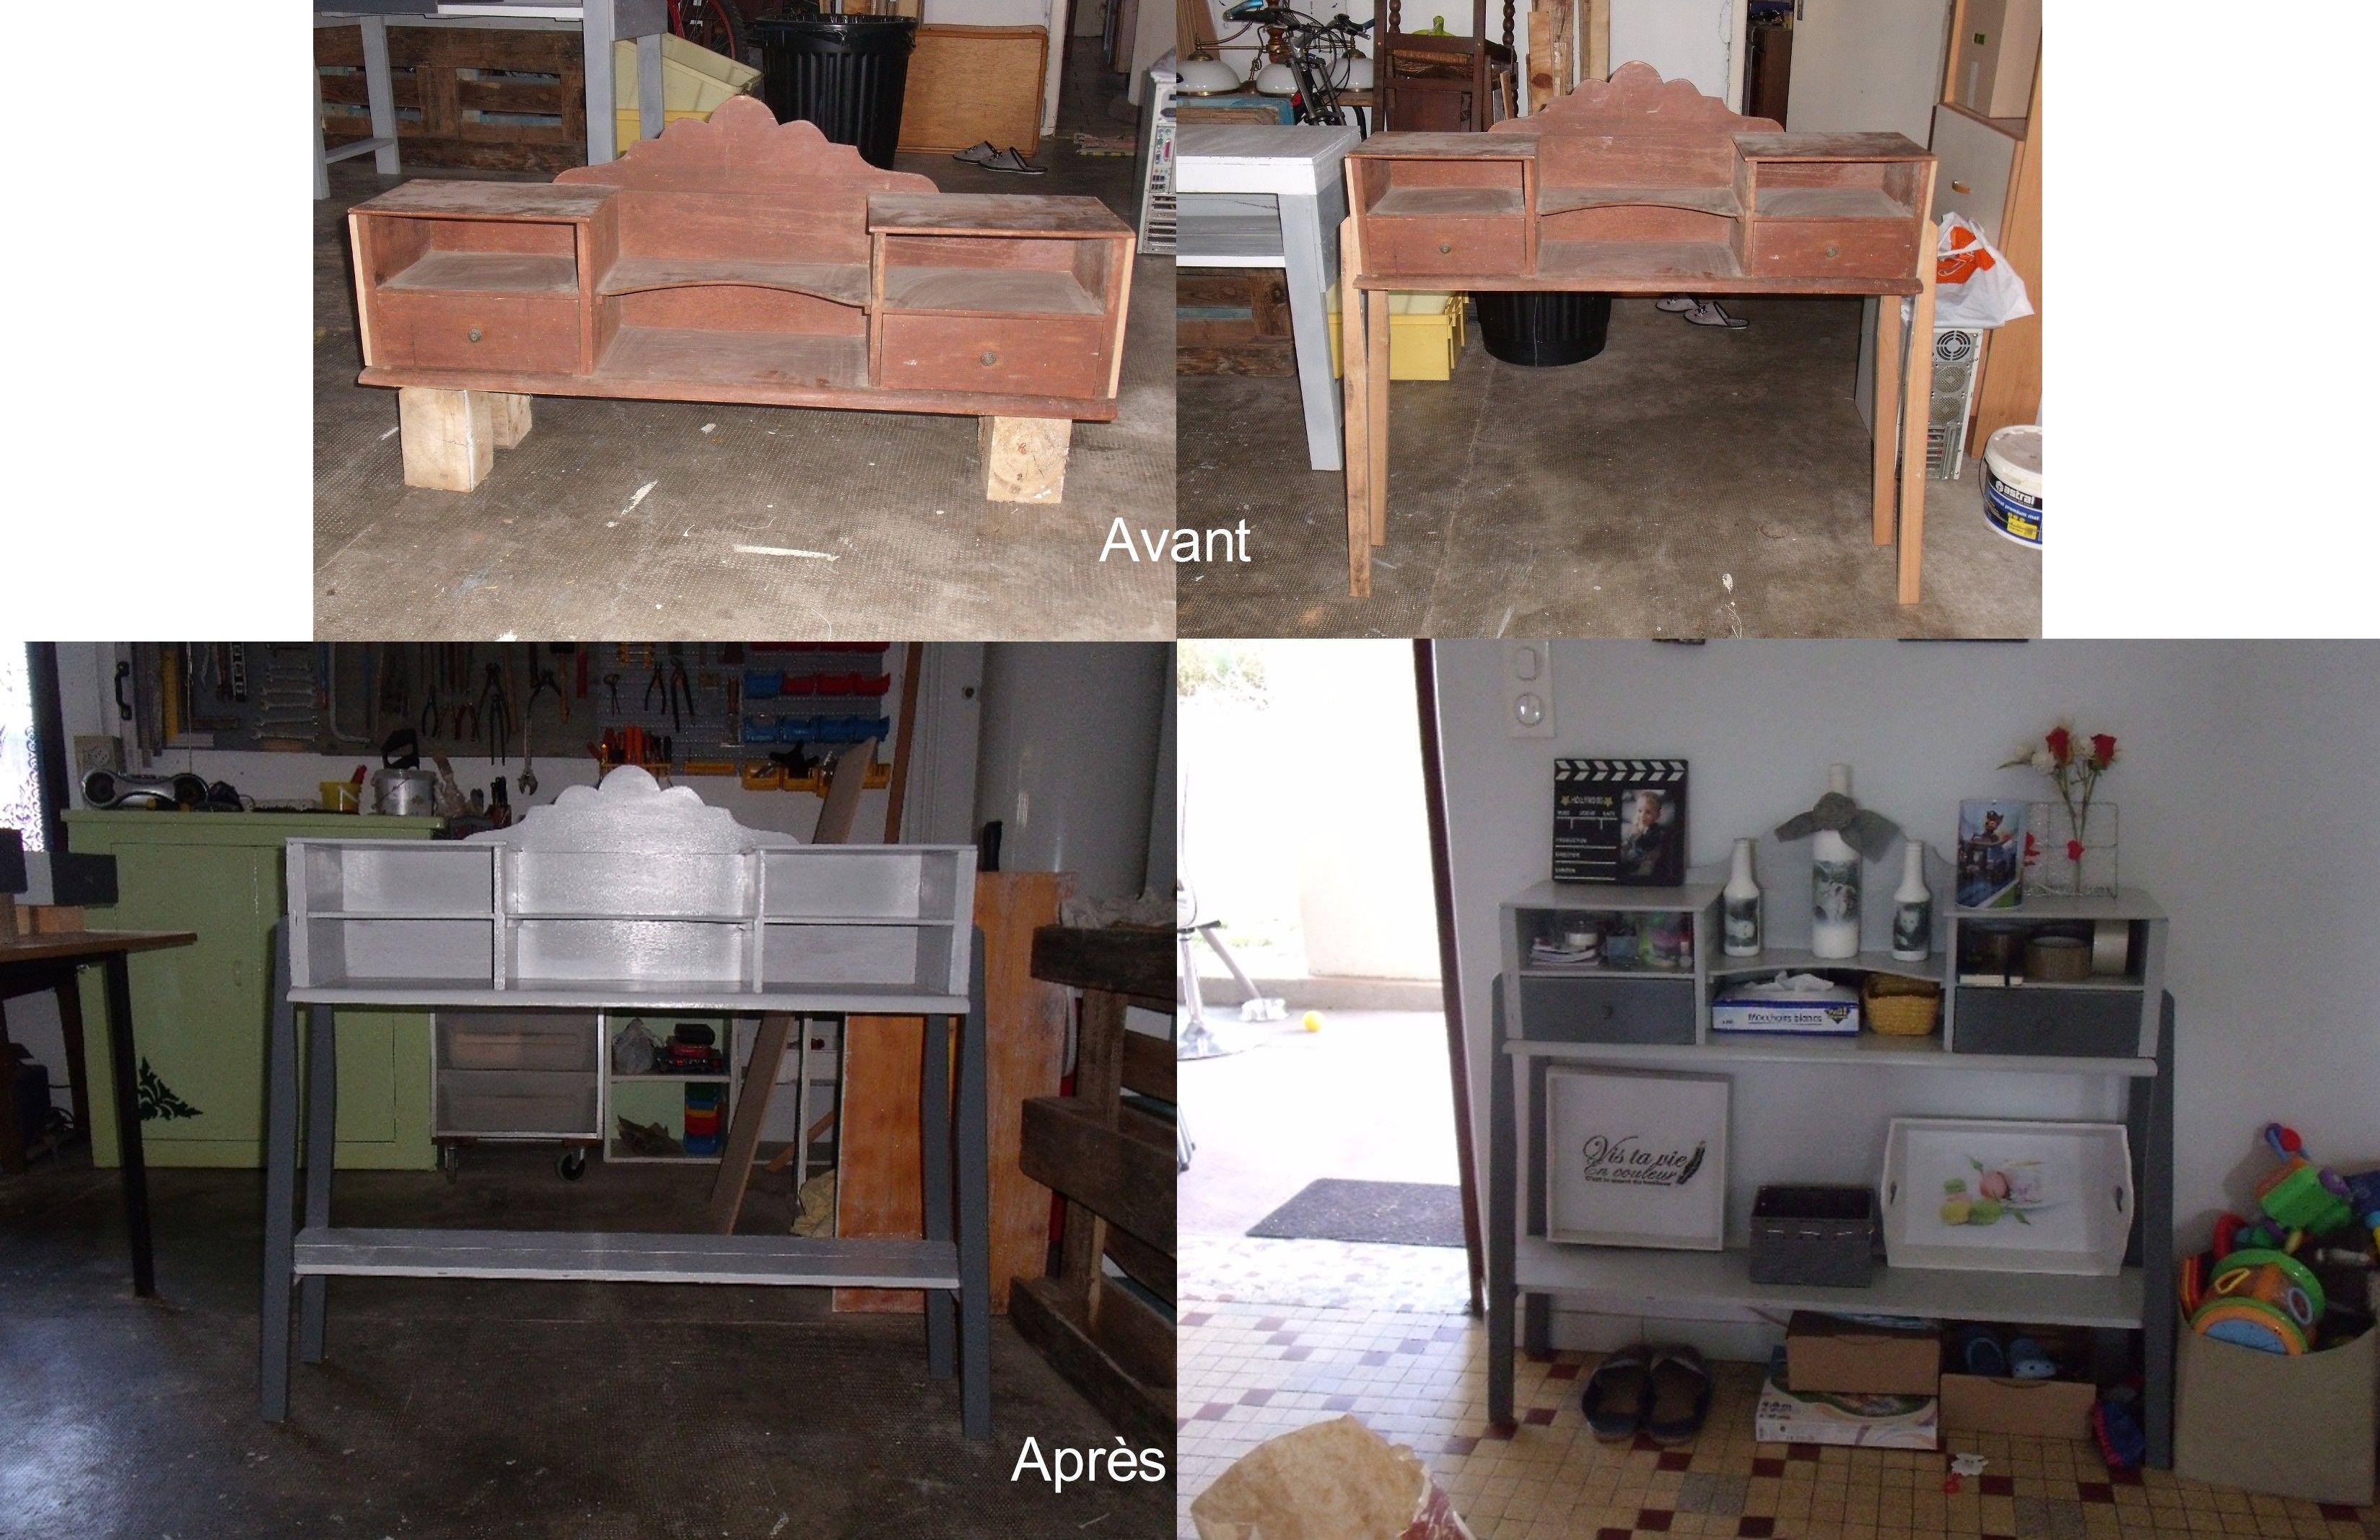 83095337159b92996bb6268a313f0f4a Impressionnant De Table Basse Opium Conception